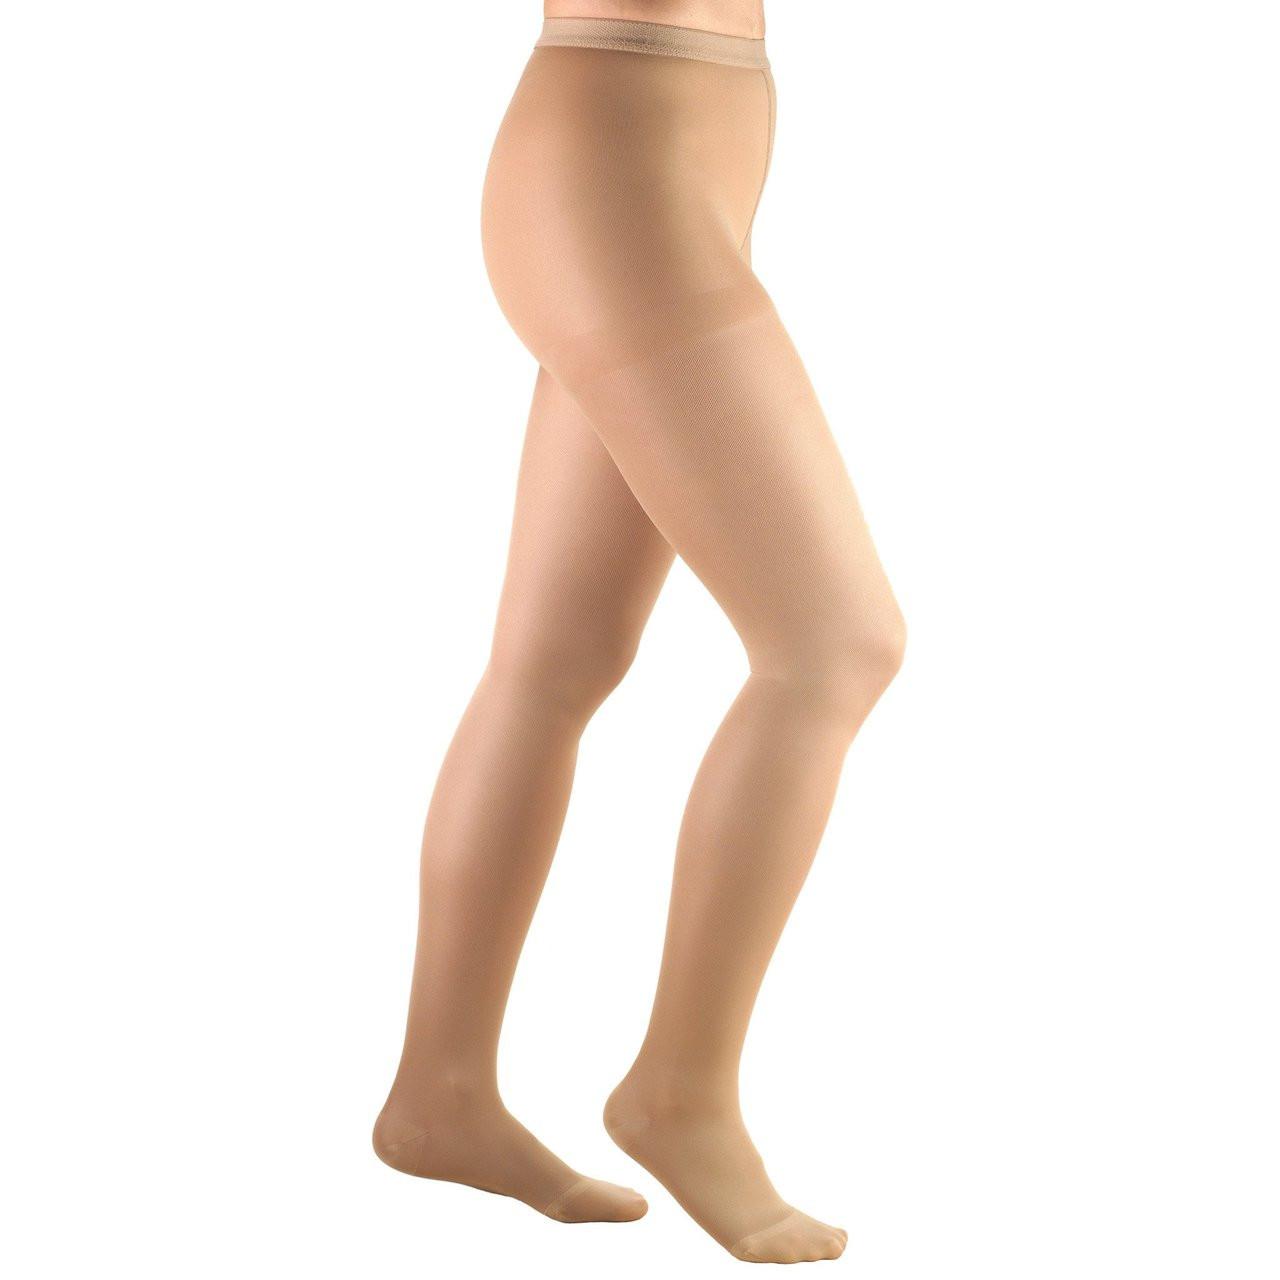 a1fcfae489f4c Truform Opaque - Pantyhose 15-20mmHg - Select Socks Inc.